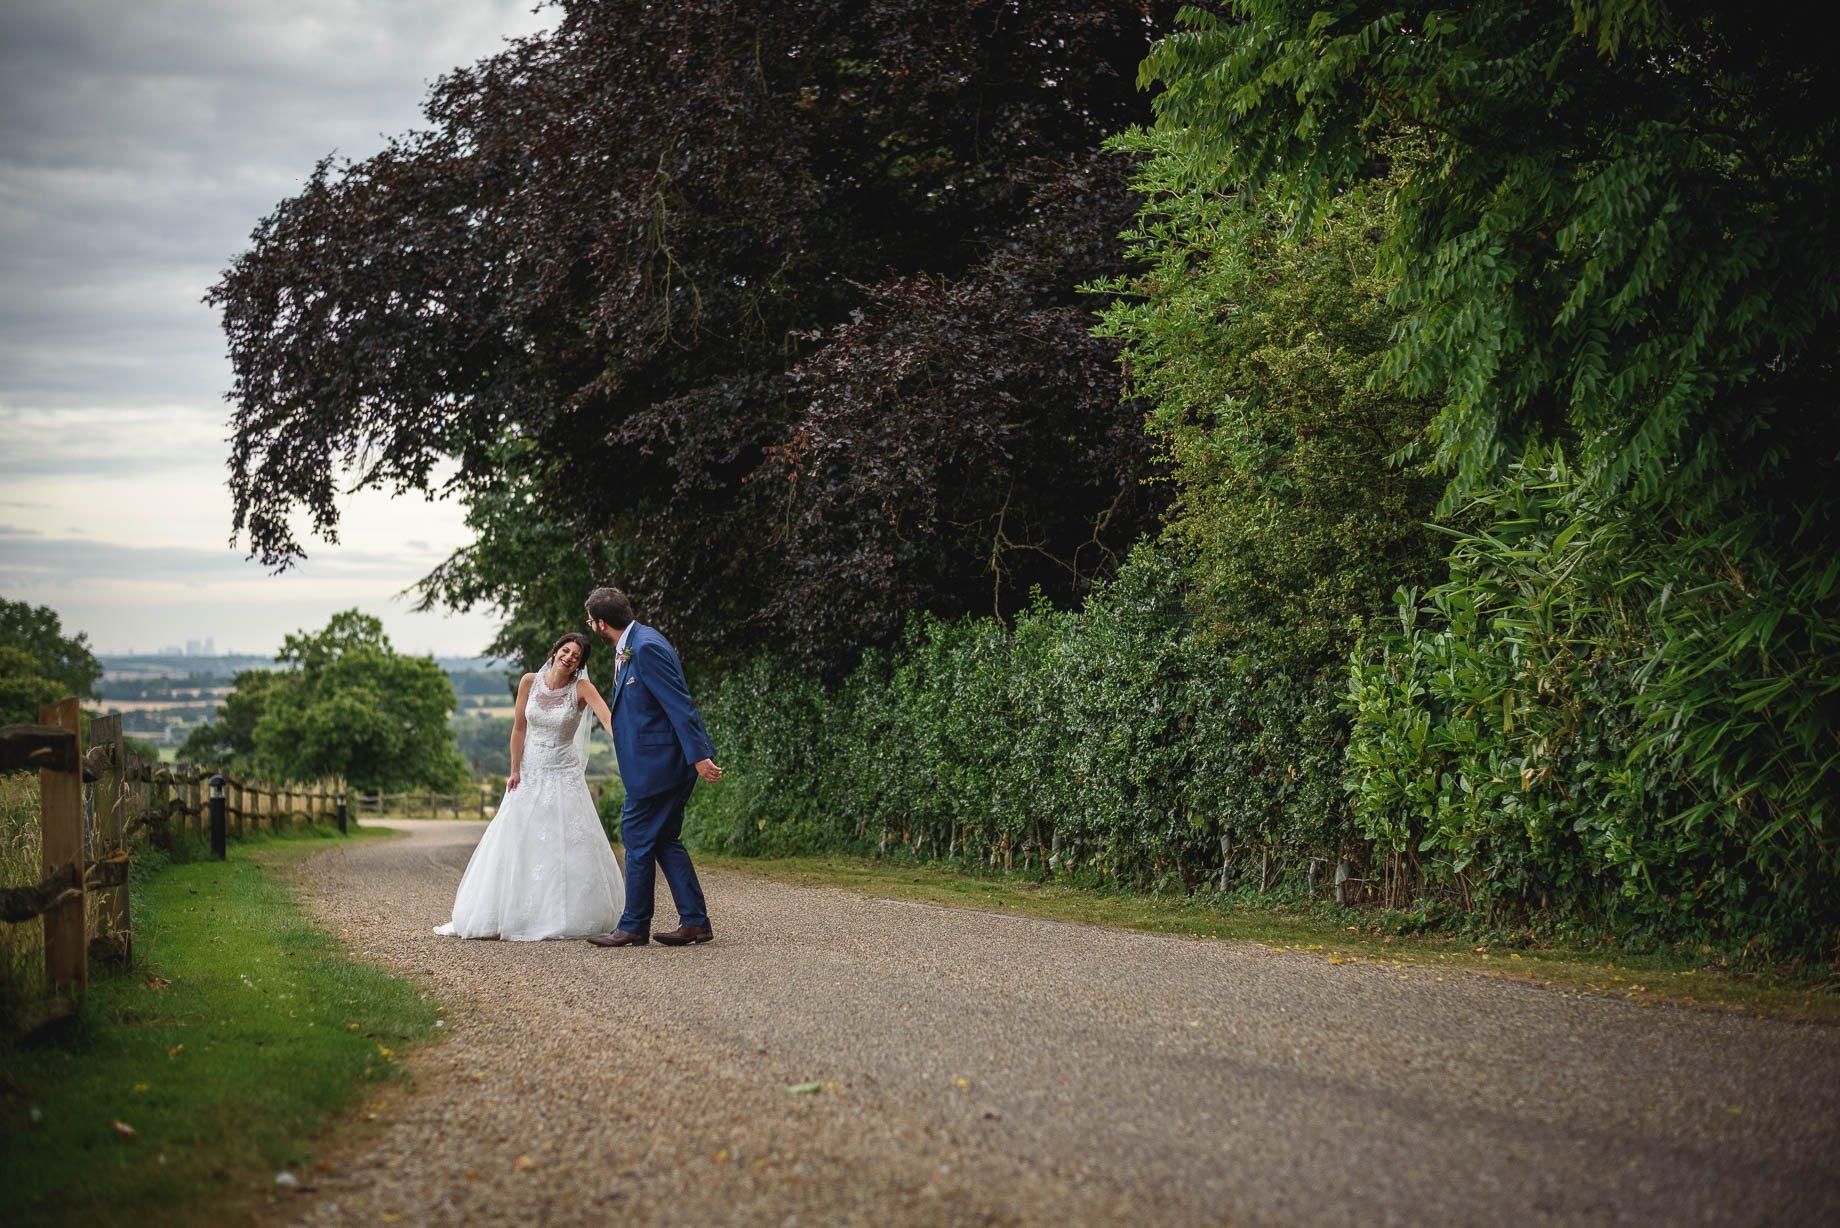 Gaynes Park wedding photography - Guy Collier Photography - Rachel and Jon (150 of 169)